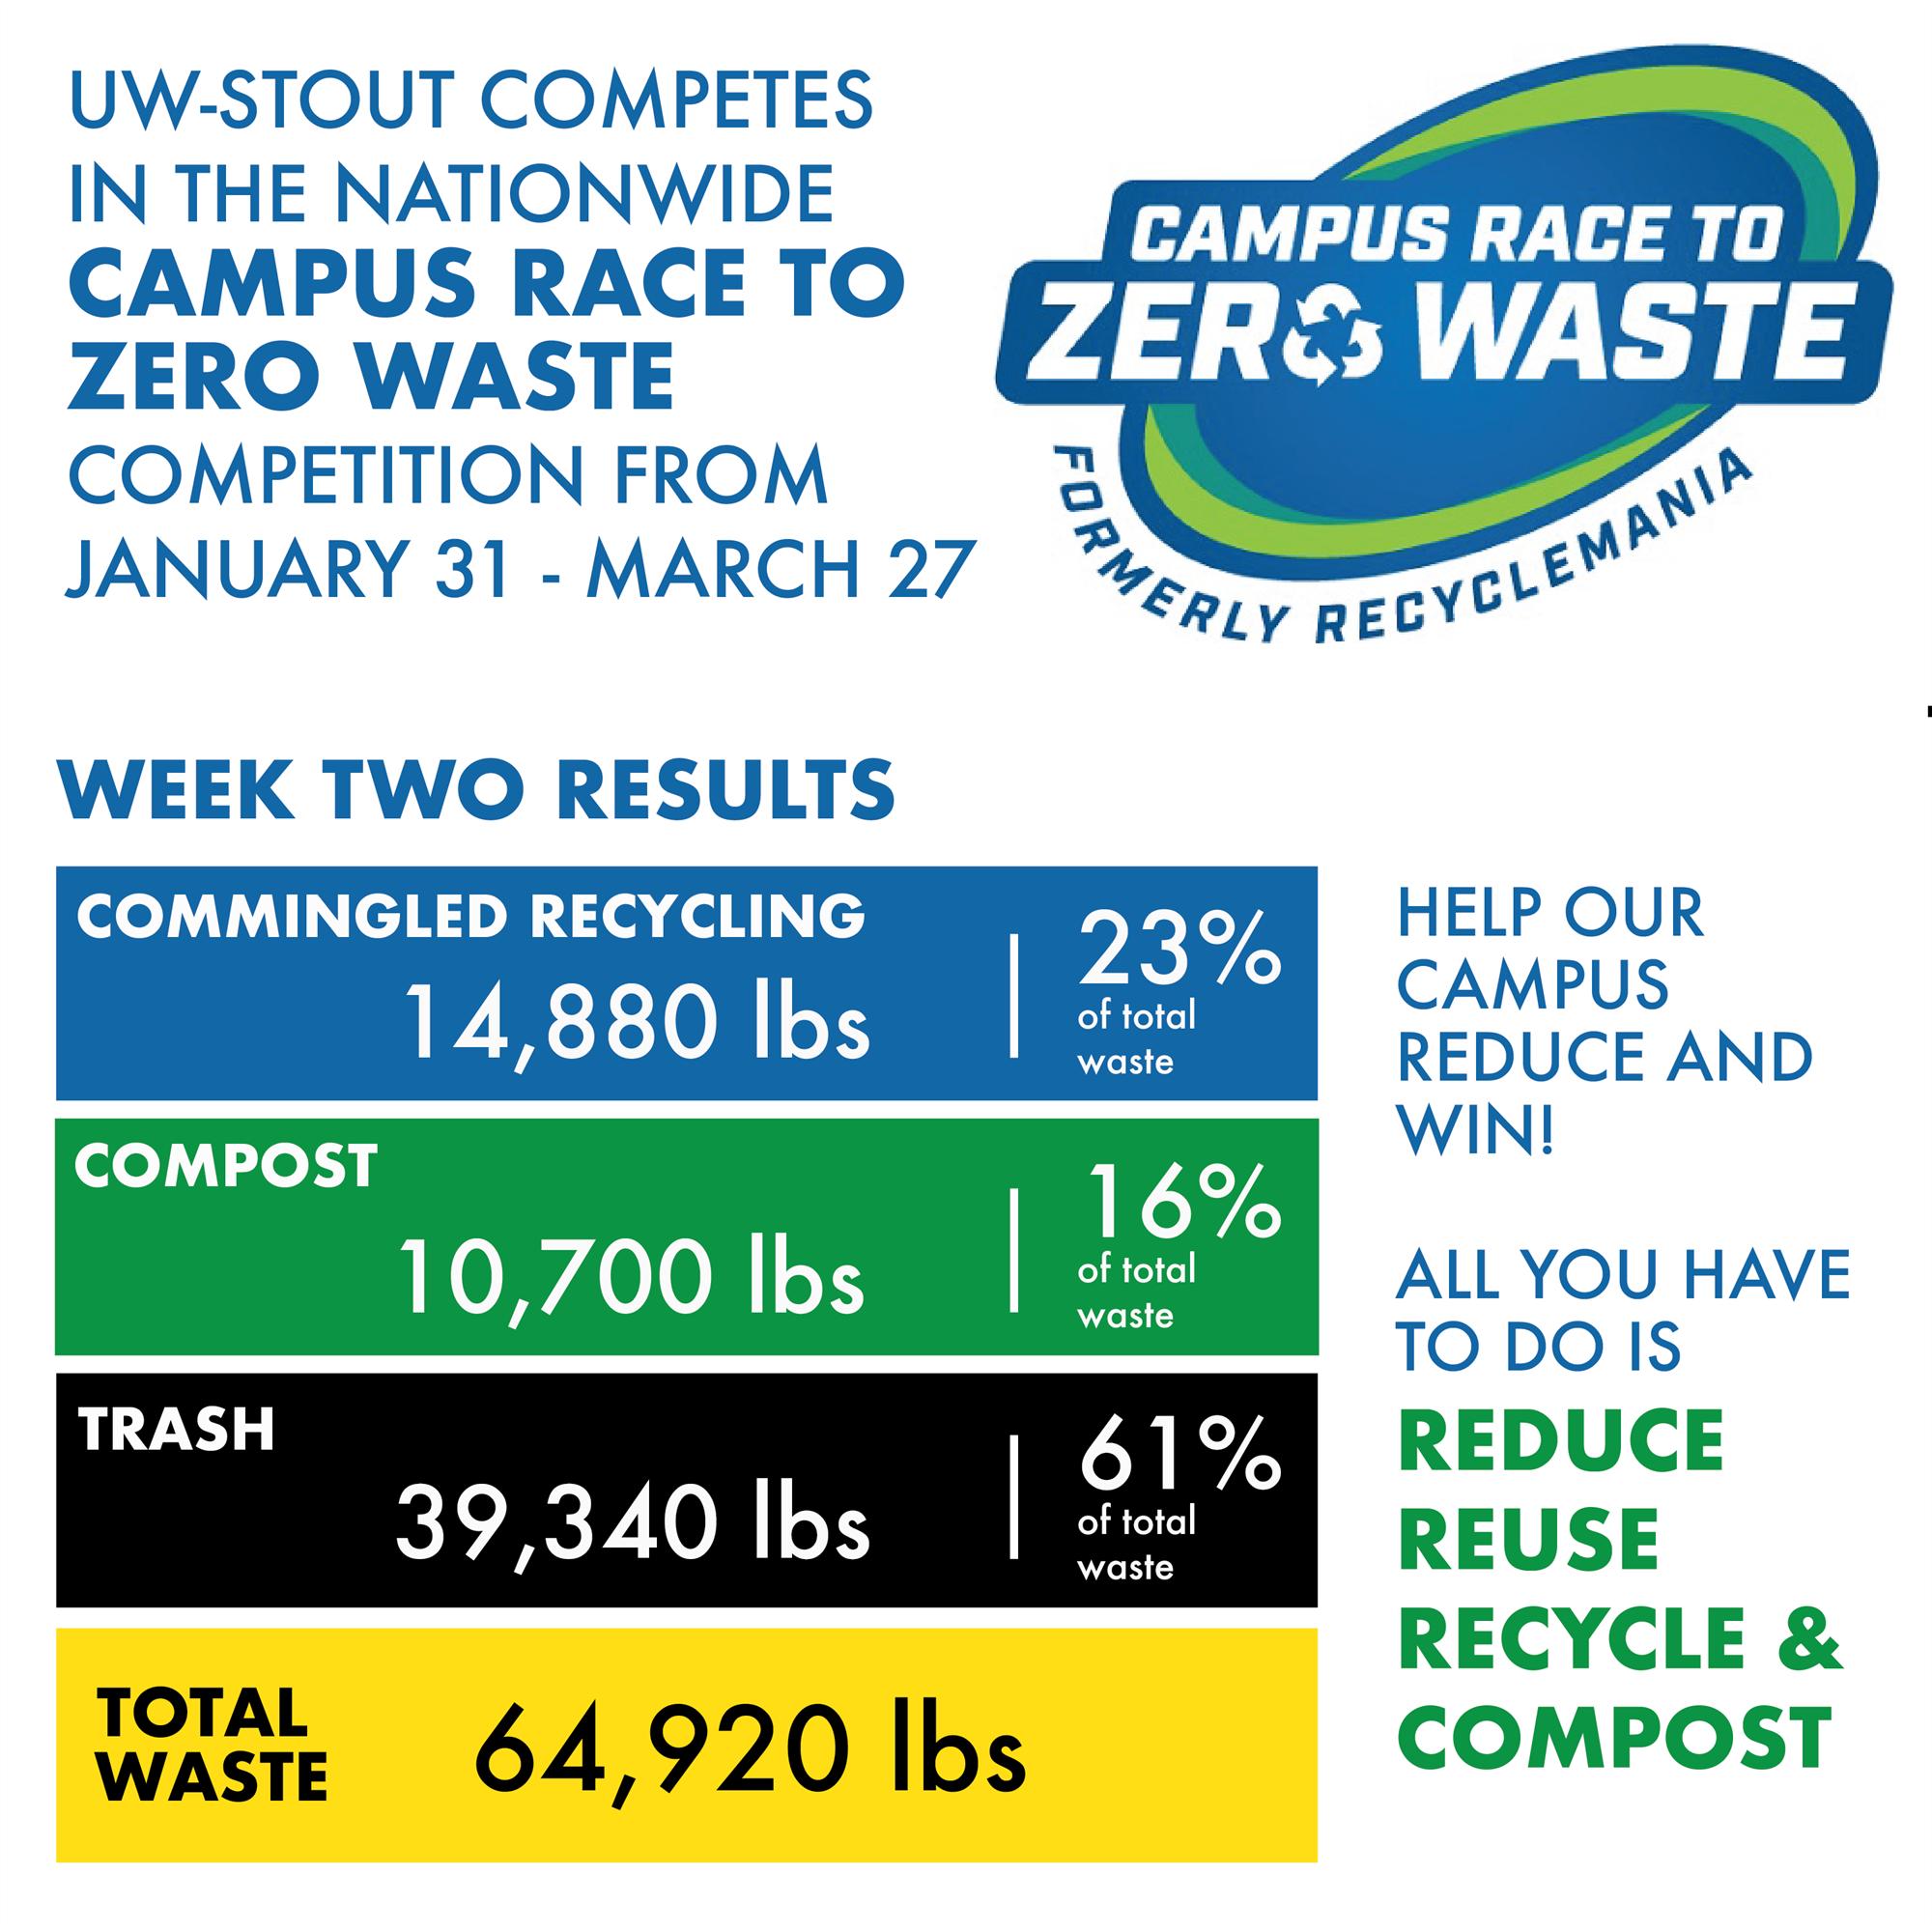 Campus Race to Zero Waste